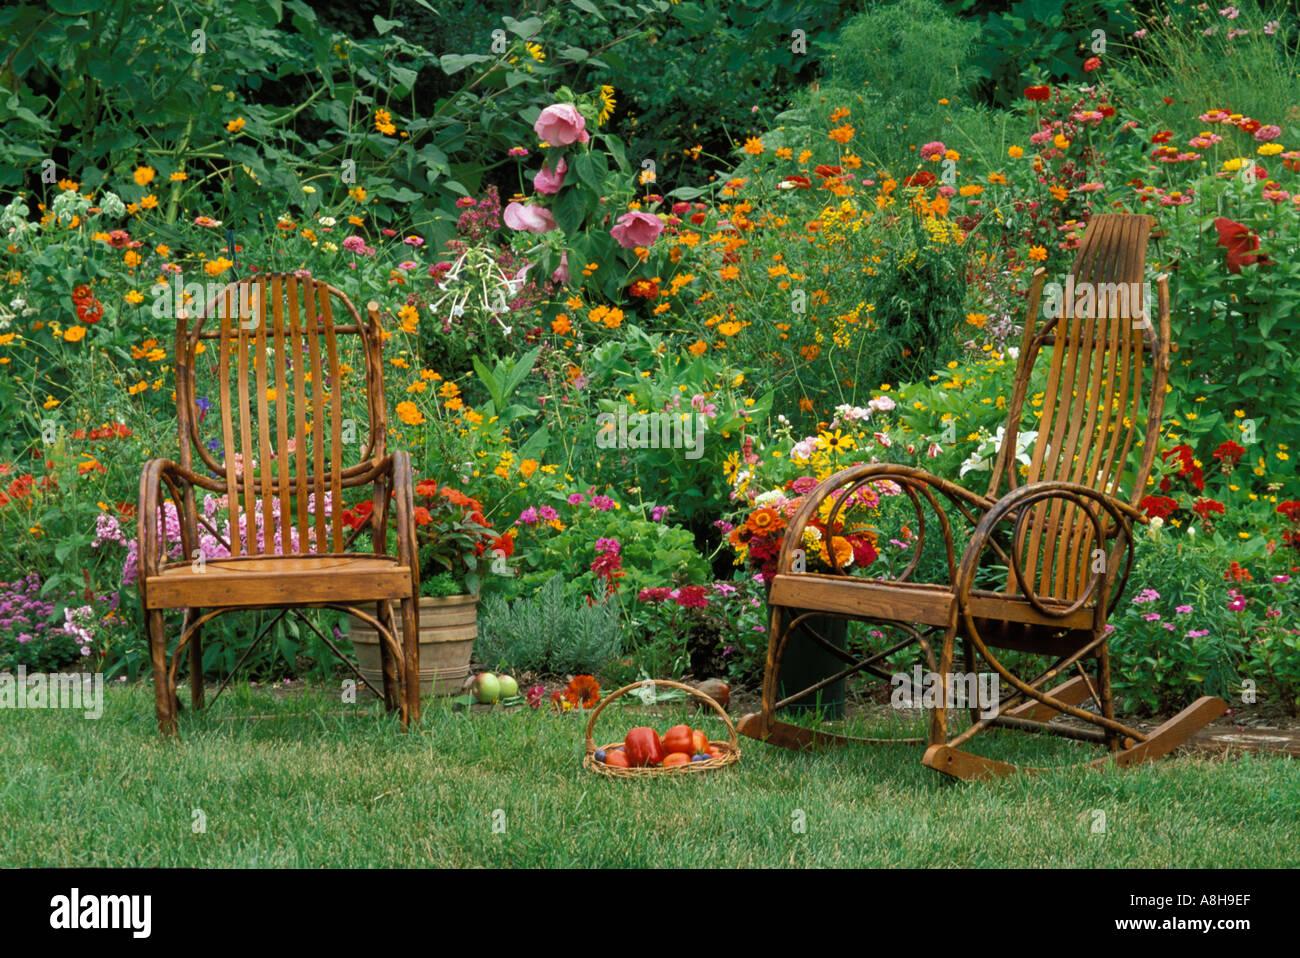 grandma and grandpa39s summer gaudy garden bentwood chairs